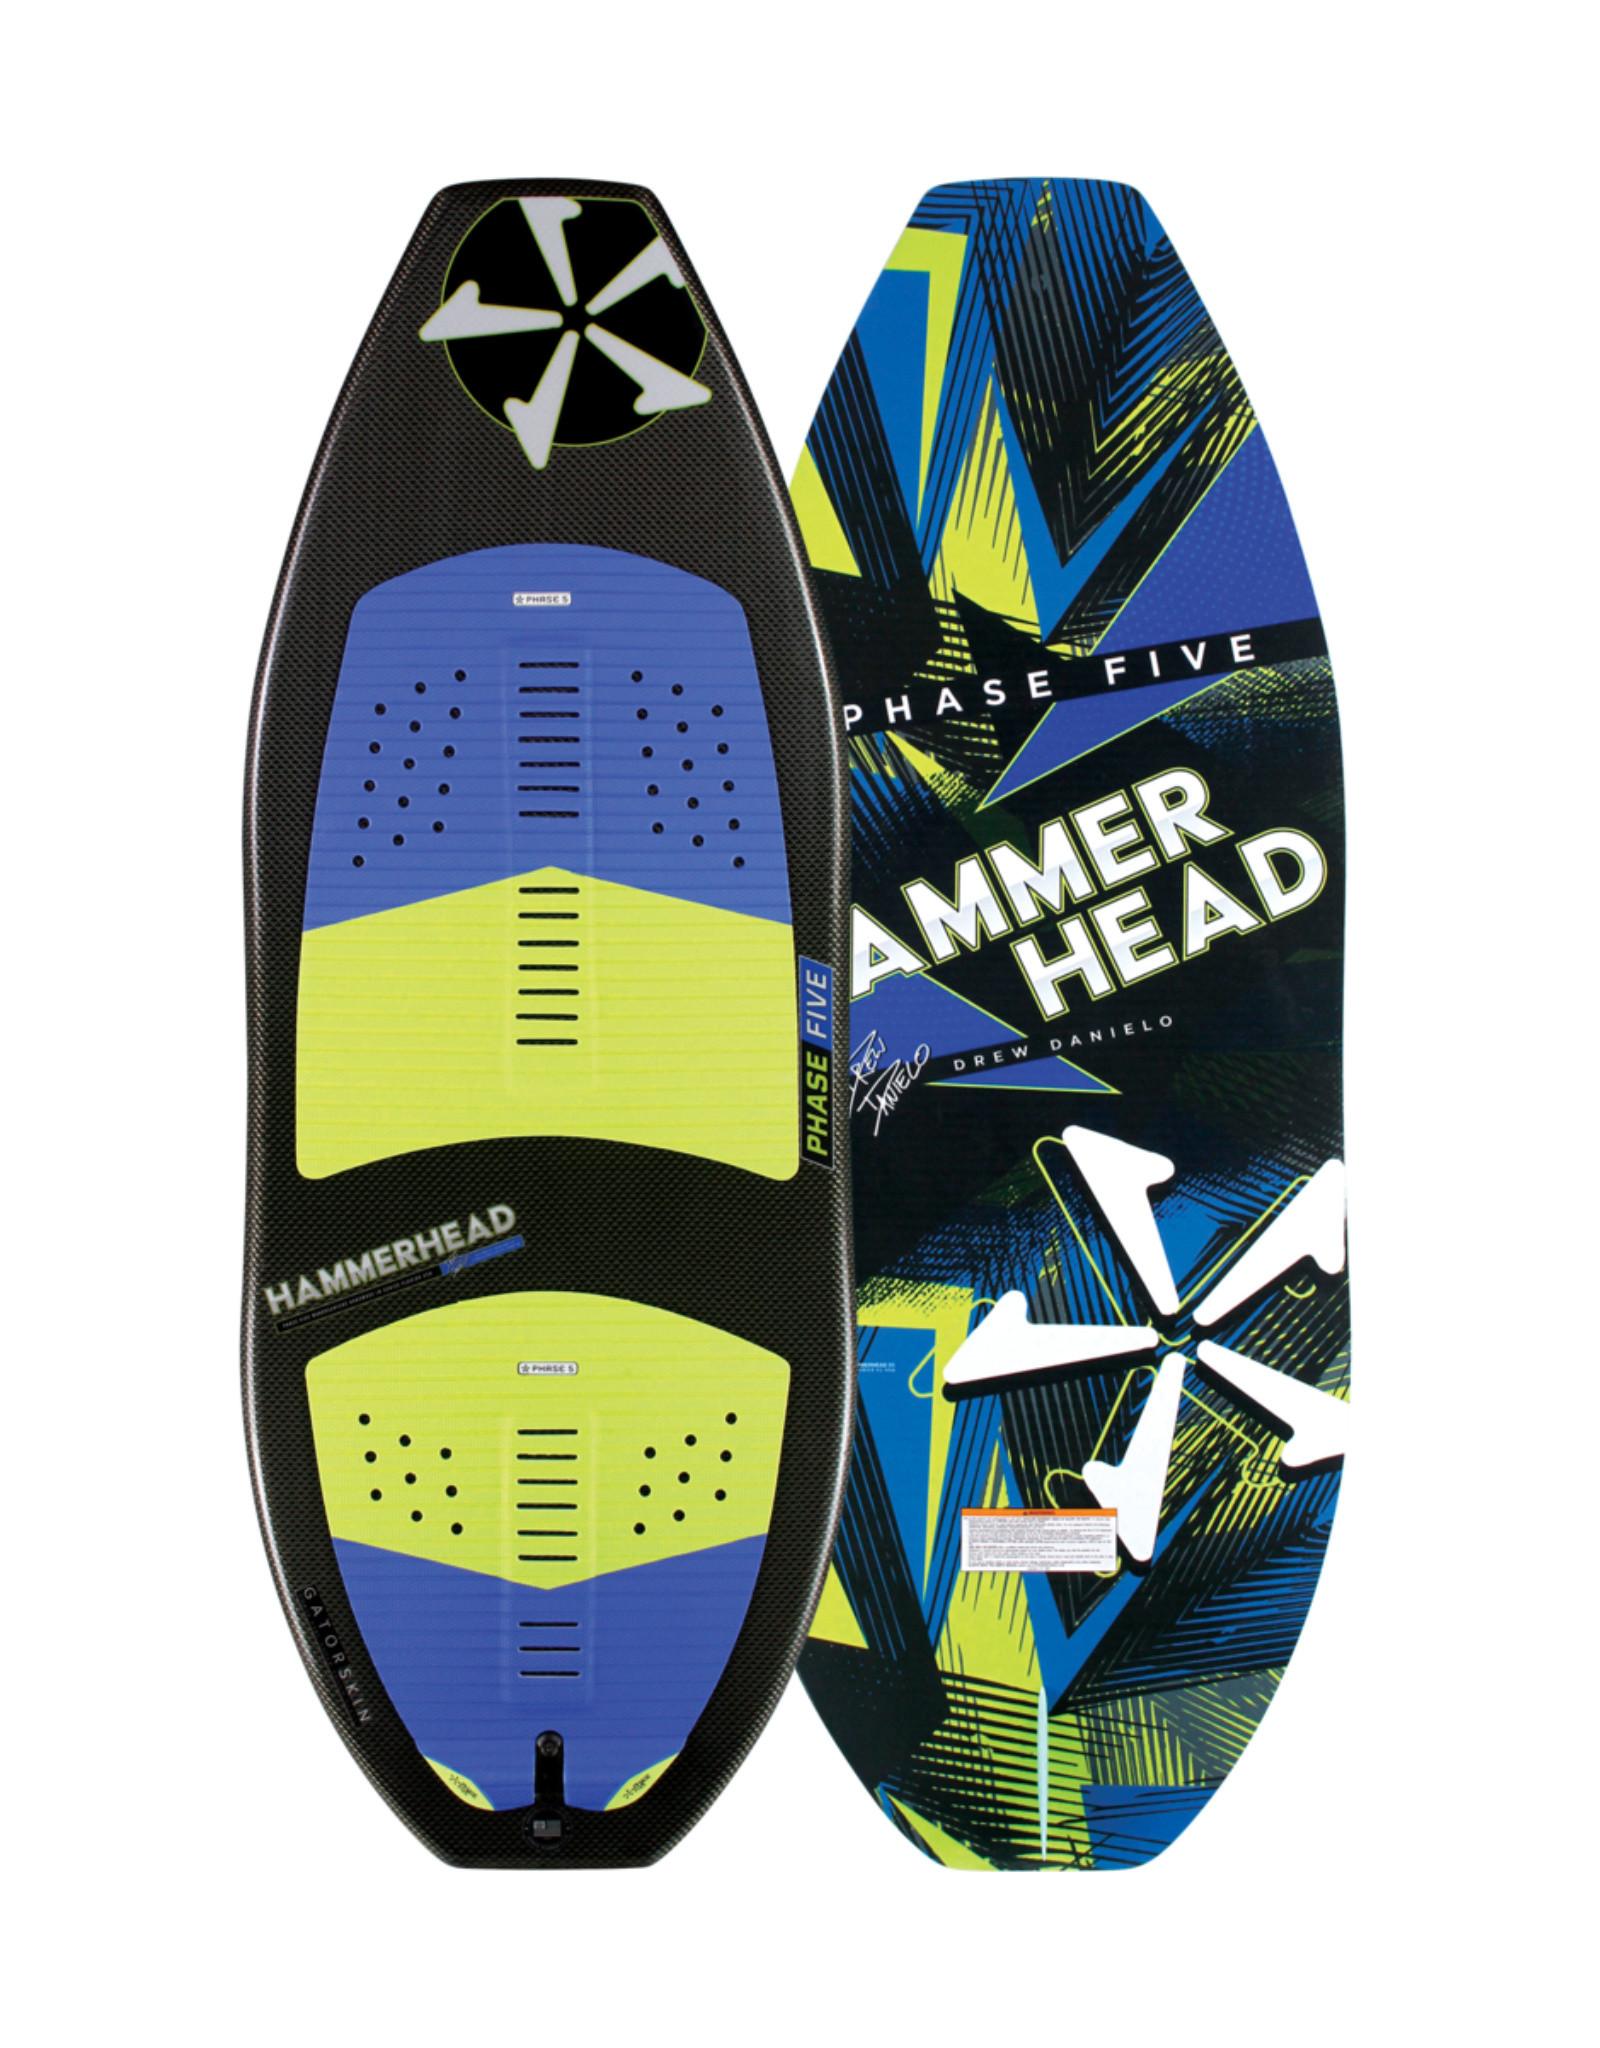 "Phase Five Phase Five Hammerhead 55"" Skim Style Wakesurf"